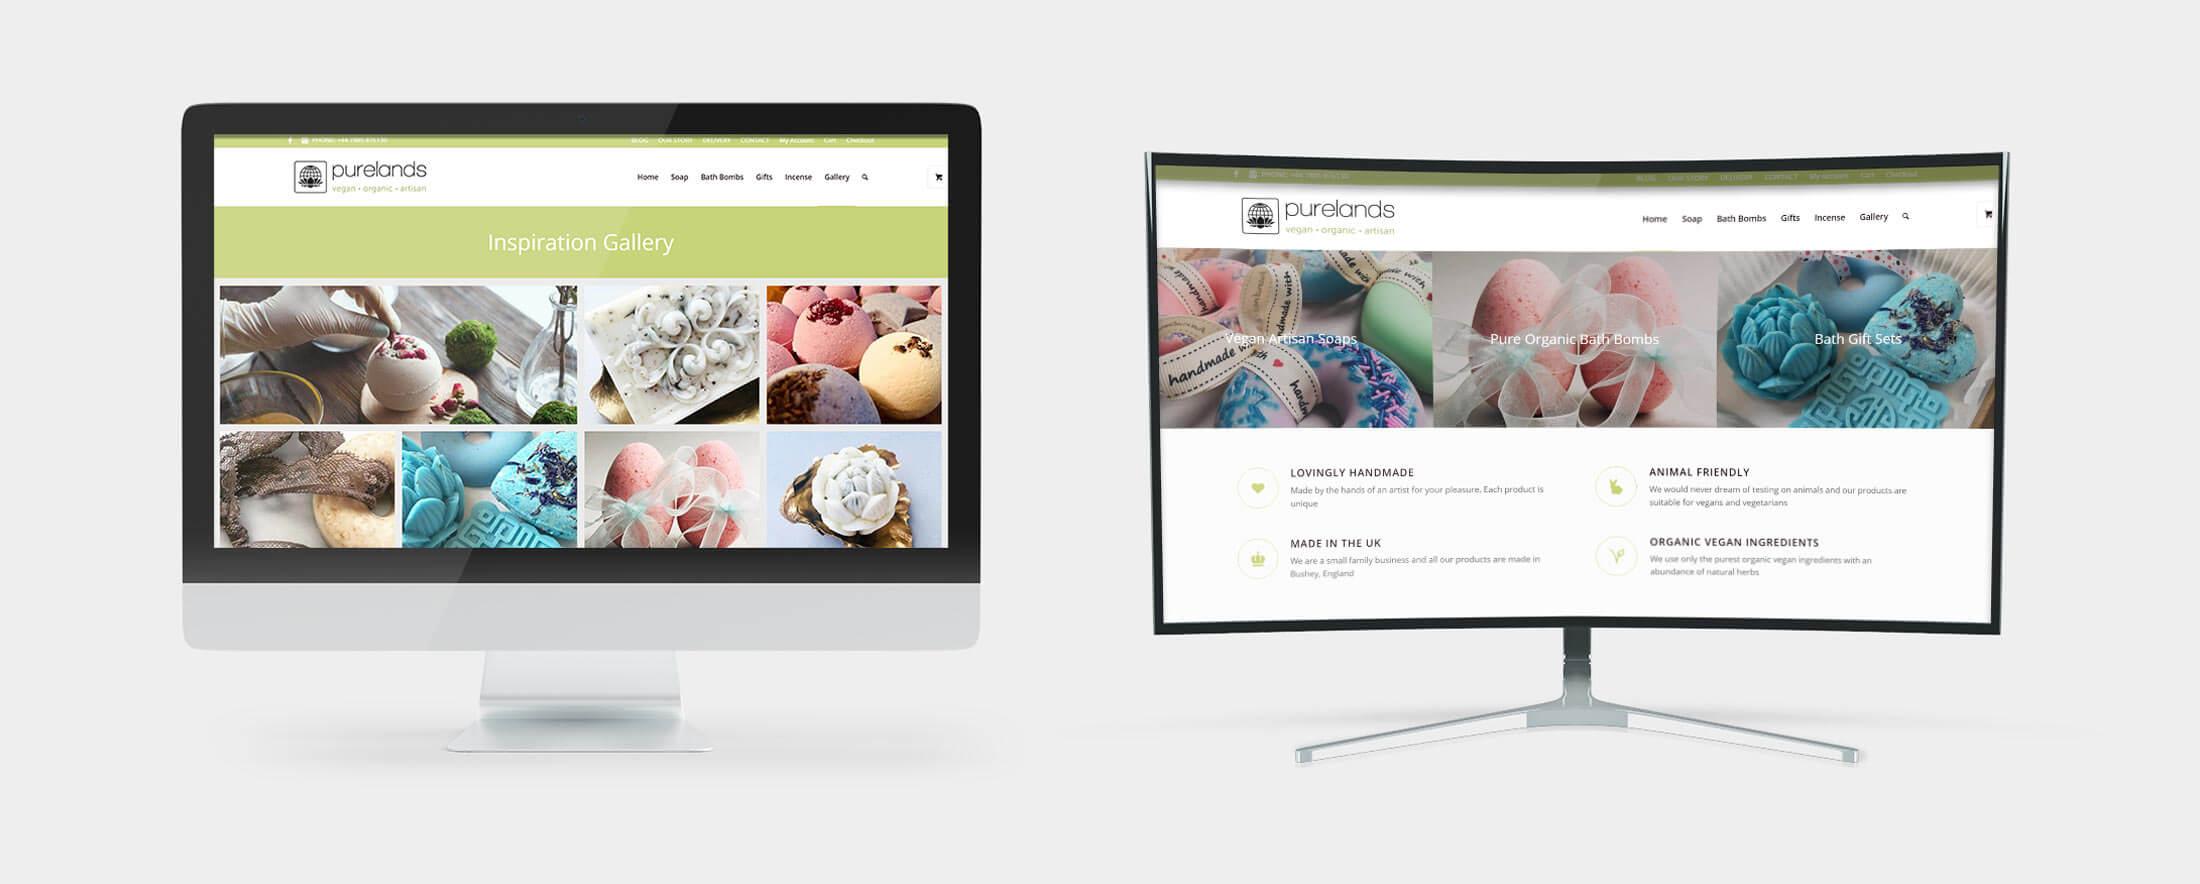 Purelands Vegan Gifts - Web Design Desktop Views